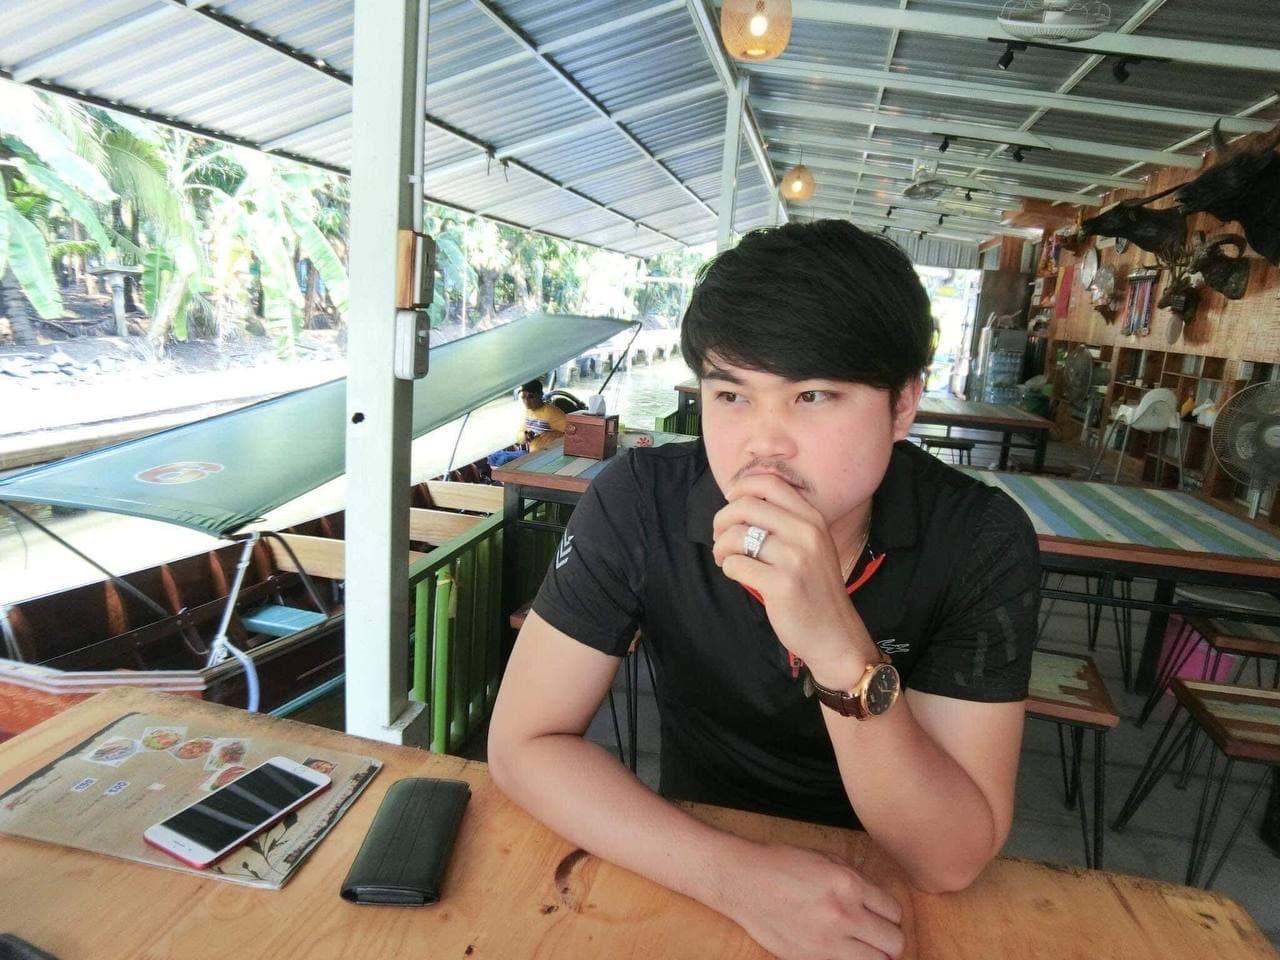 Entrepreneur Kheam Panha reveals the secrets to multiply your finances